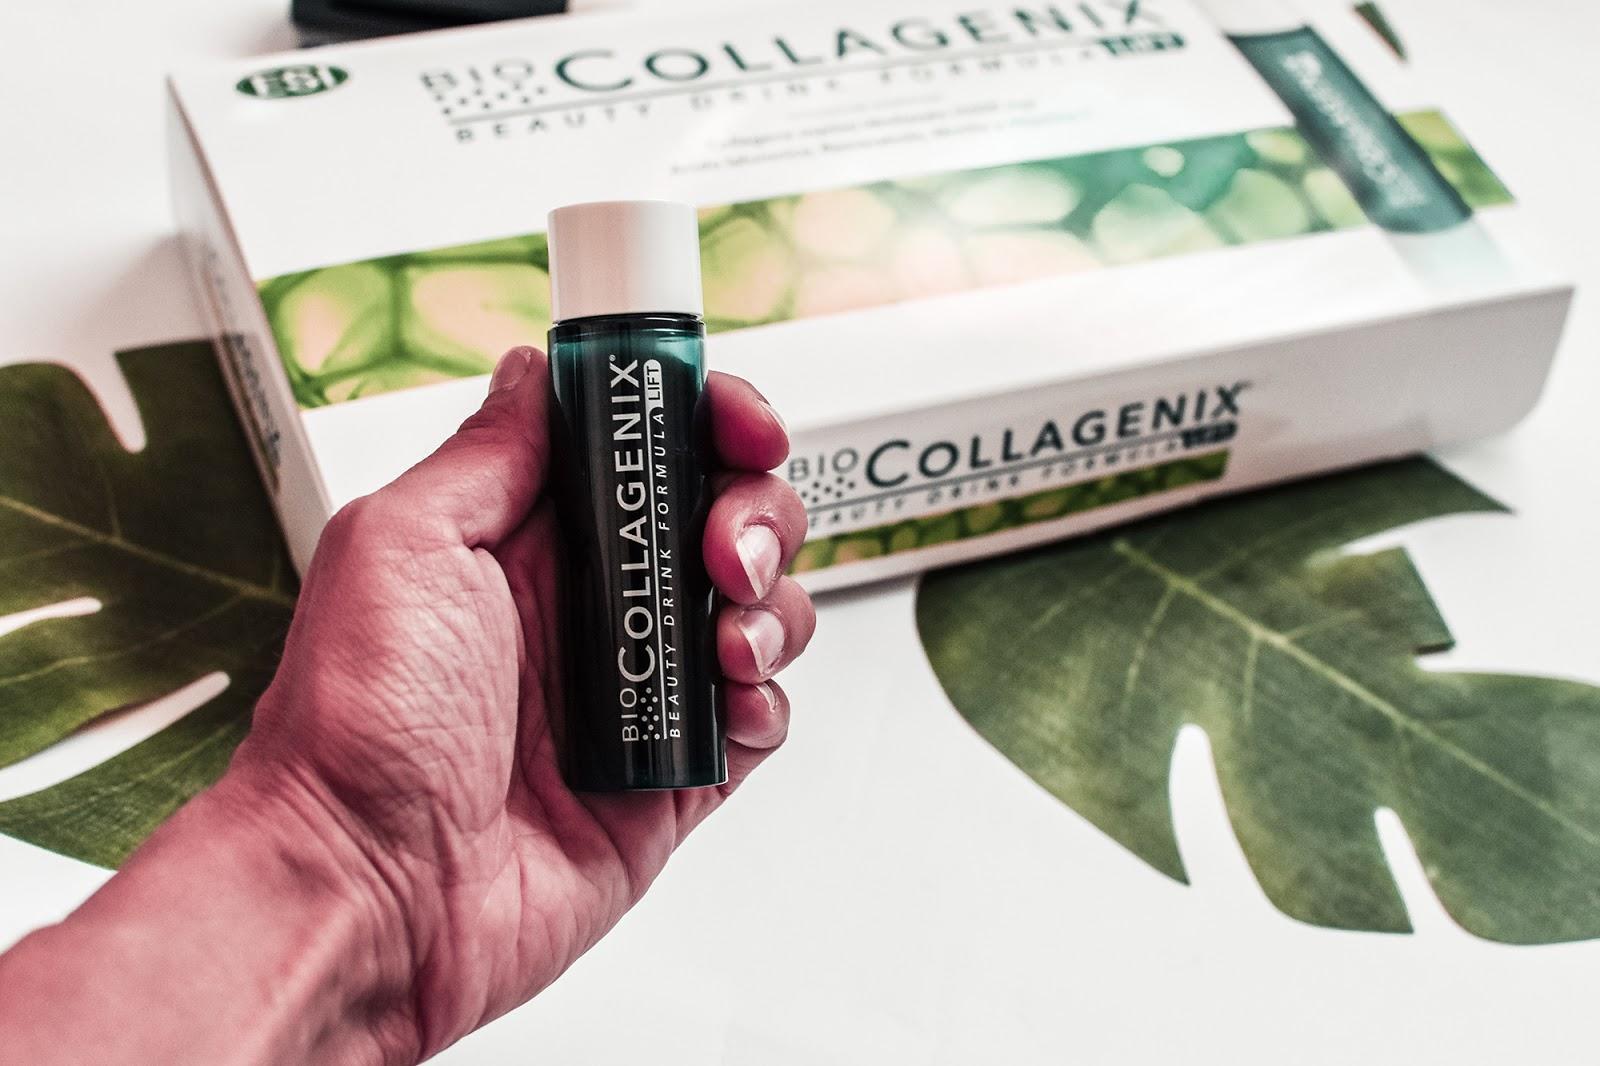 biocollagenix esi